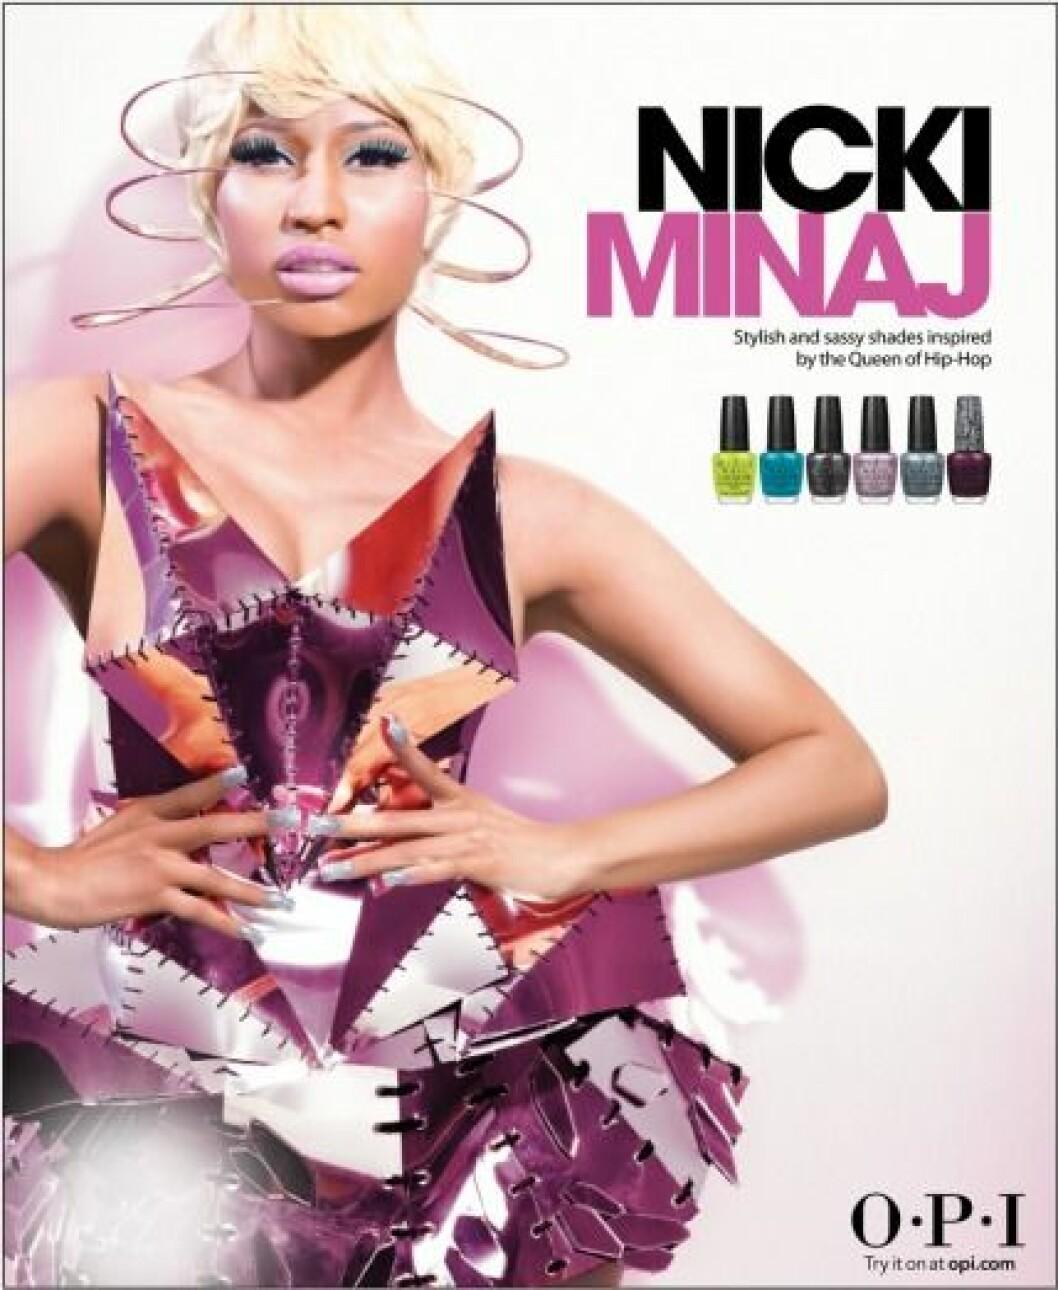 Nicki Minaj OPI Nail Lacquer Collection 2012.